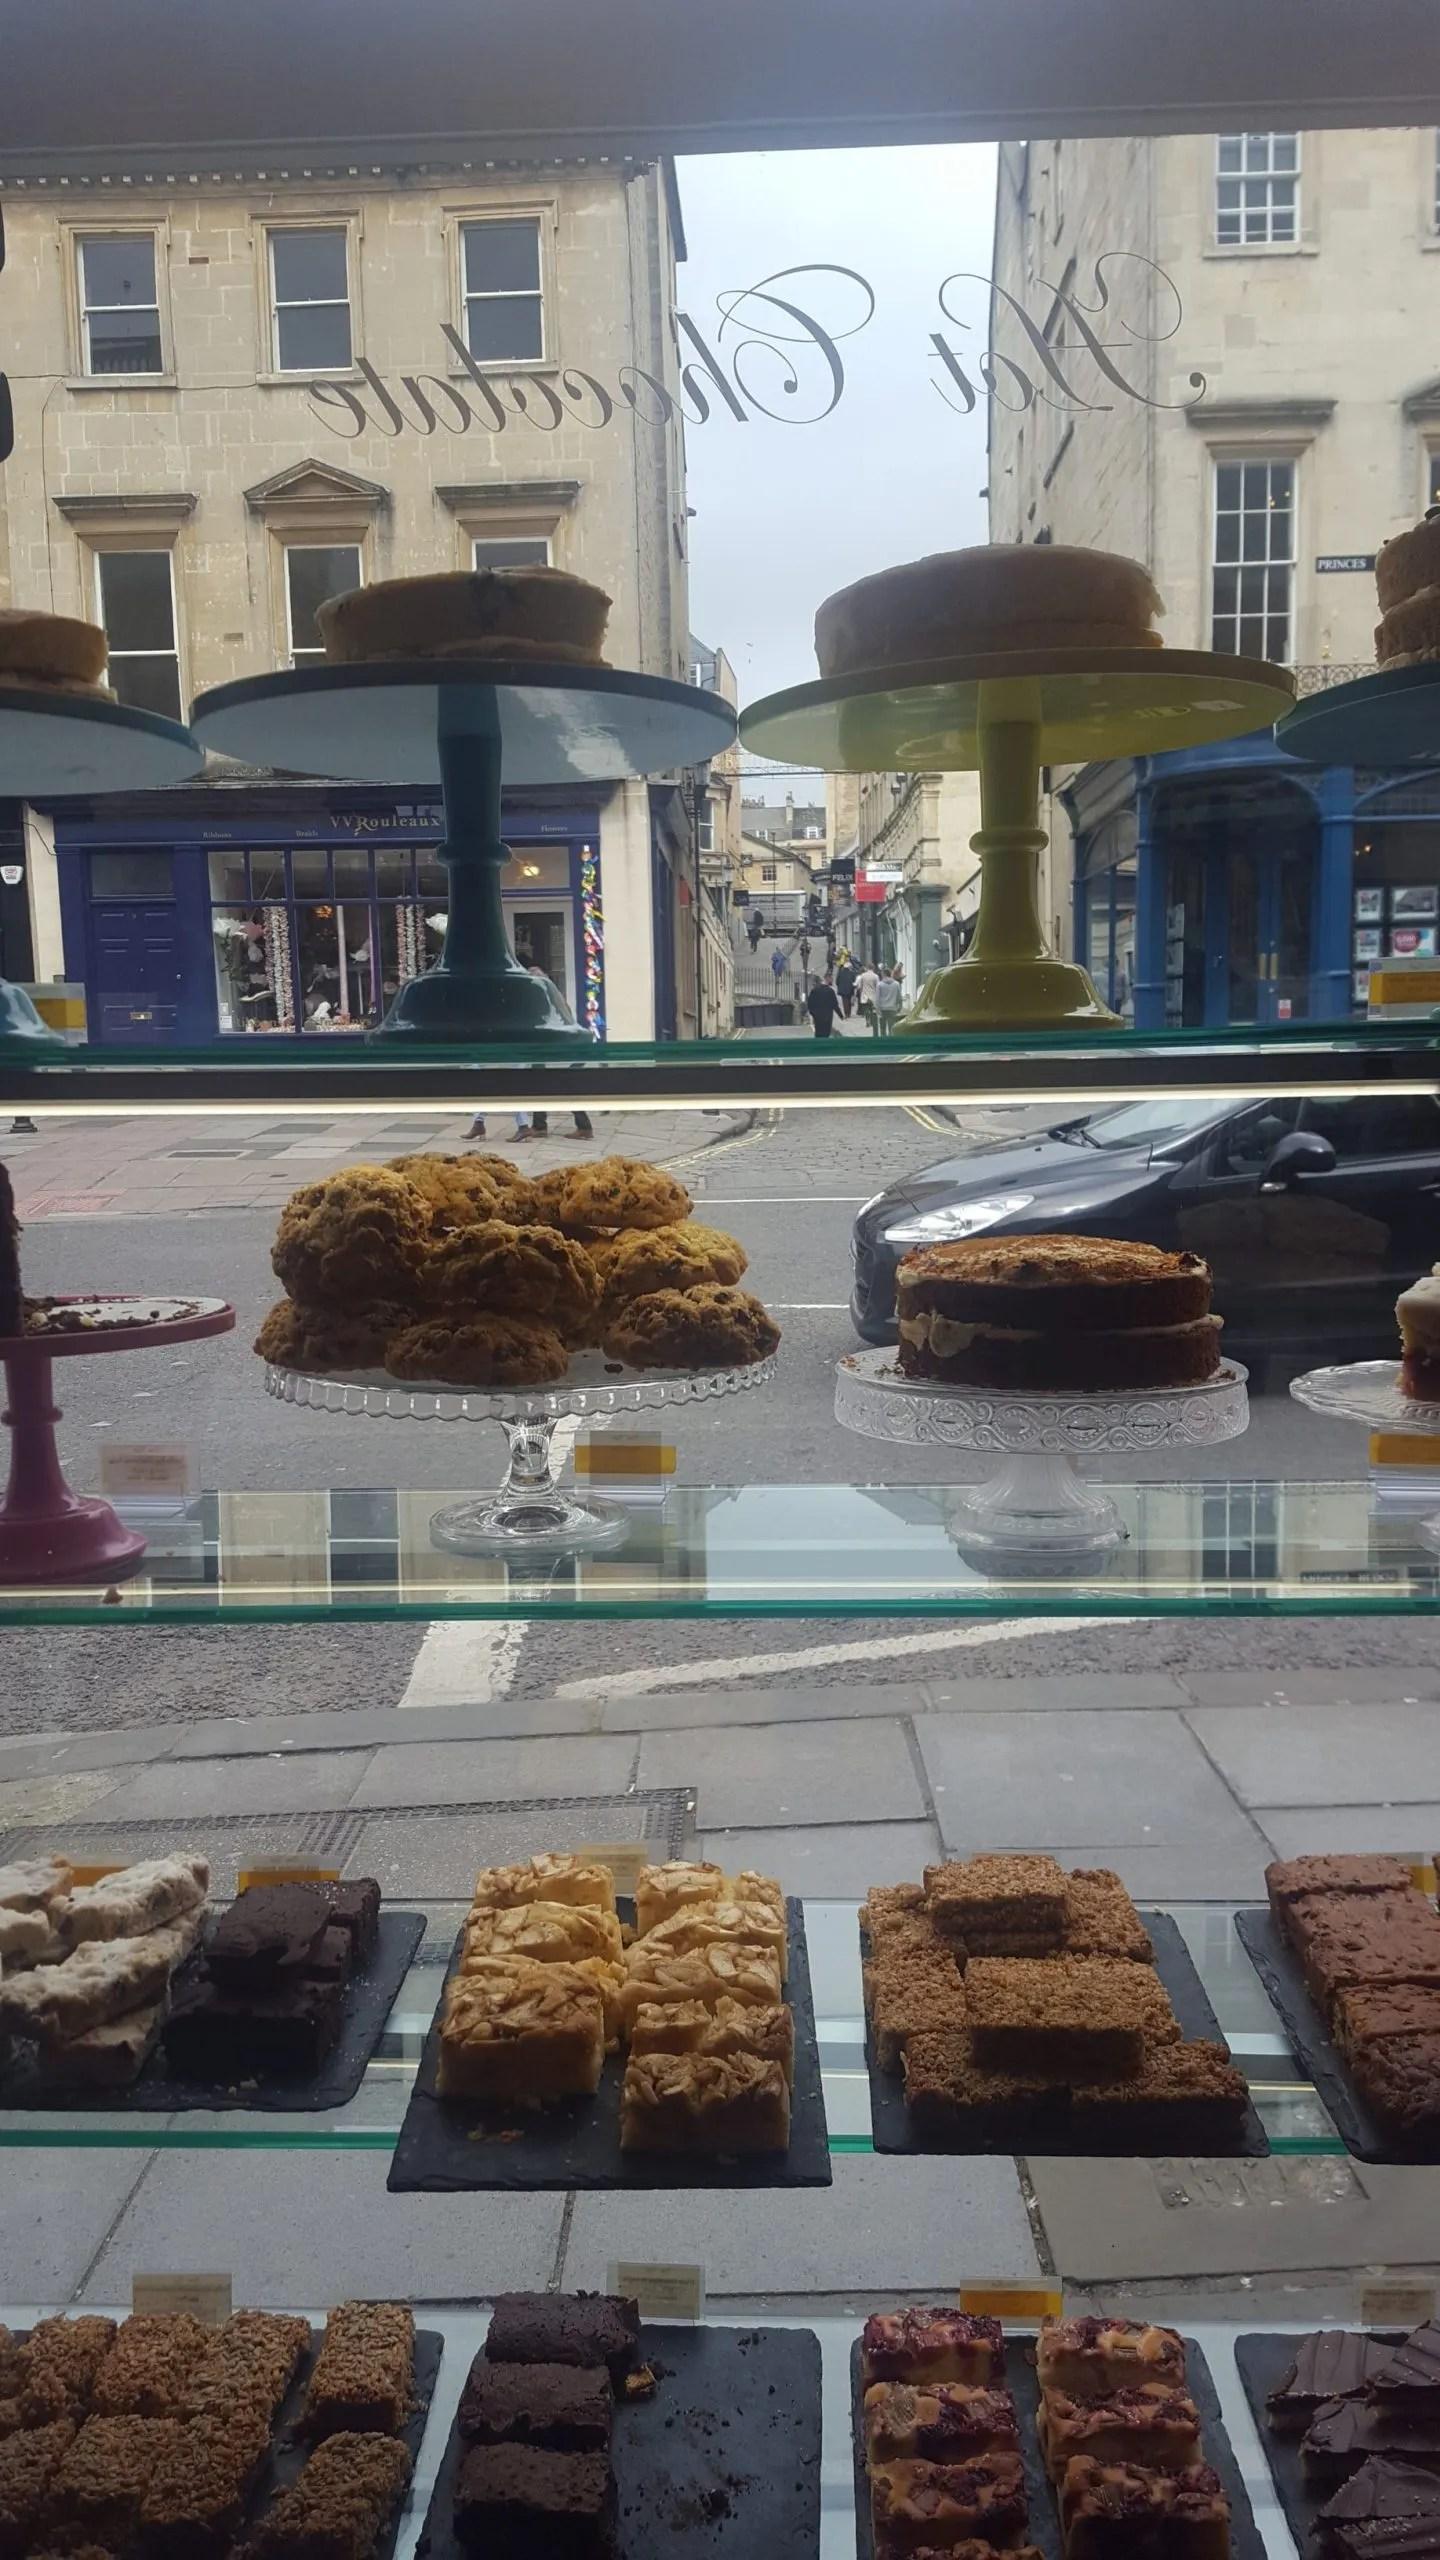 Bath Cake Shop window